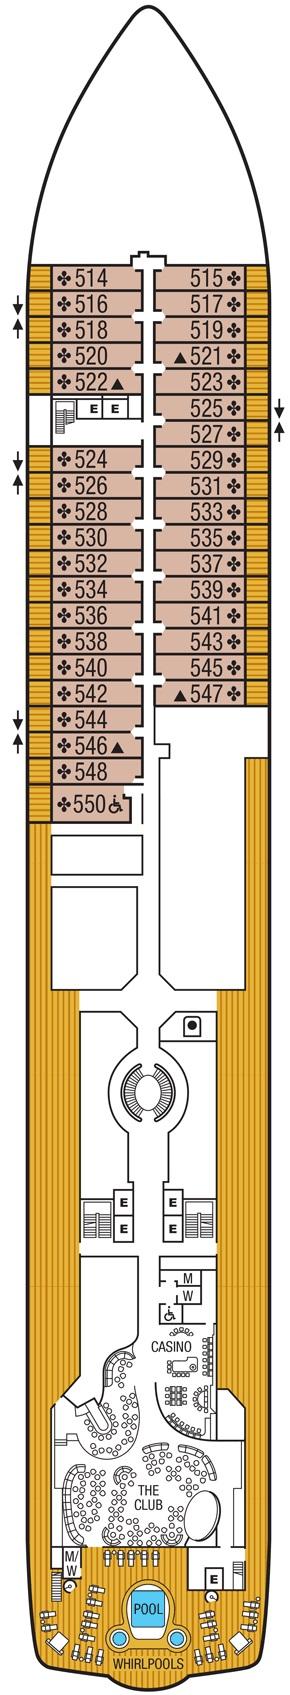 Seabourn Encore - Deck 05